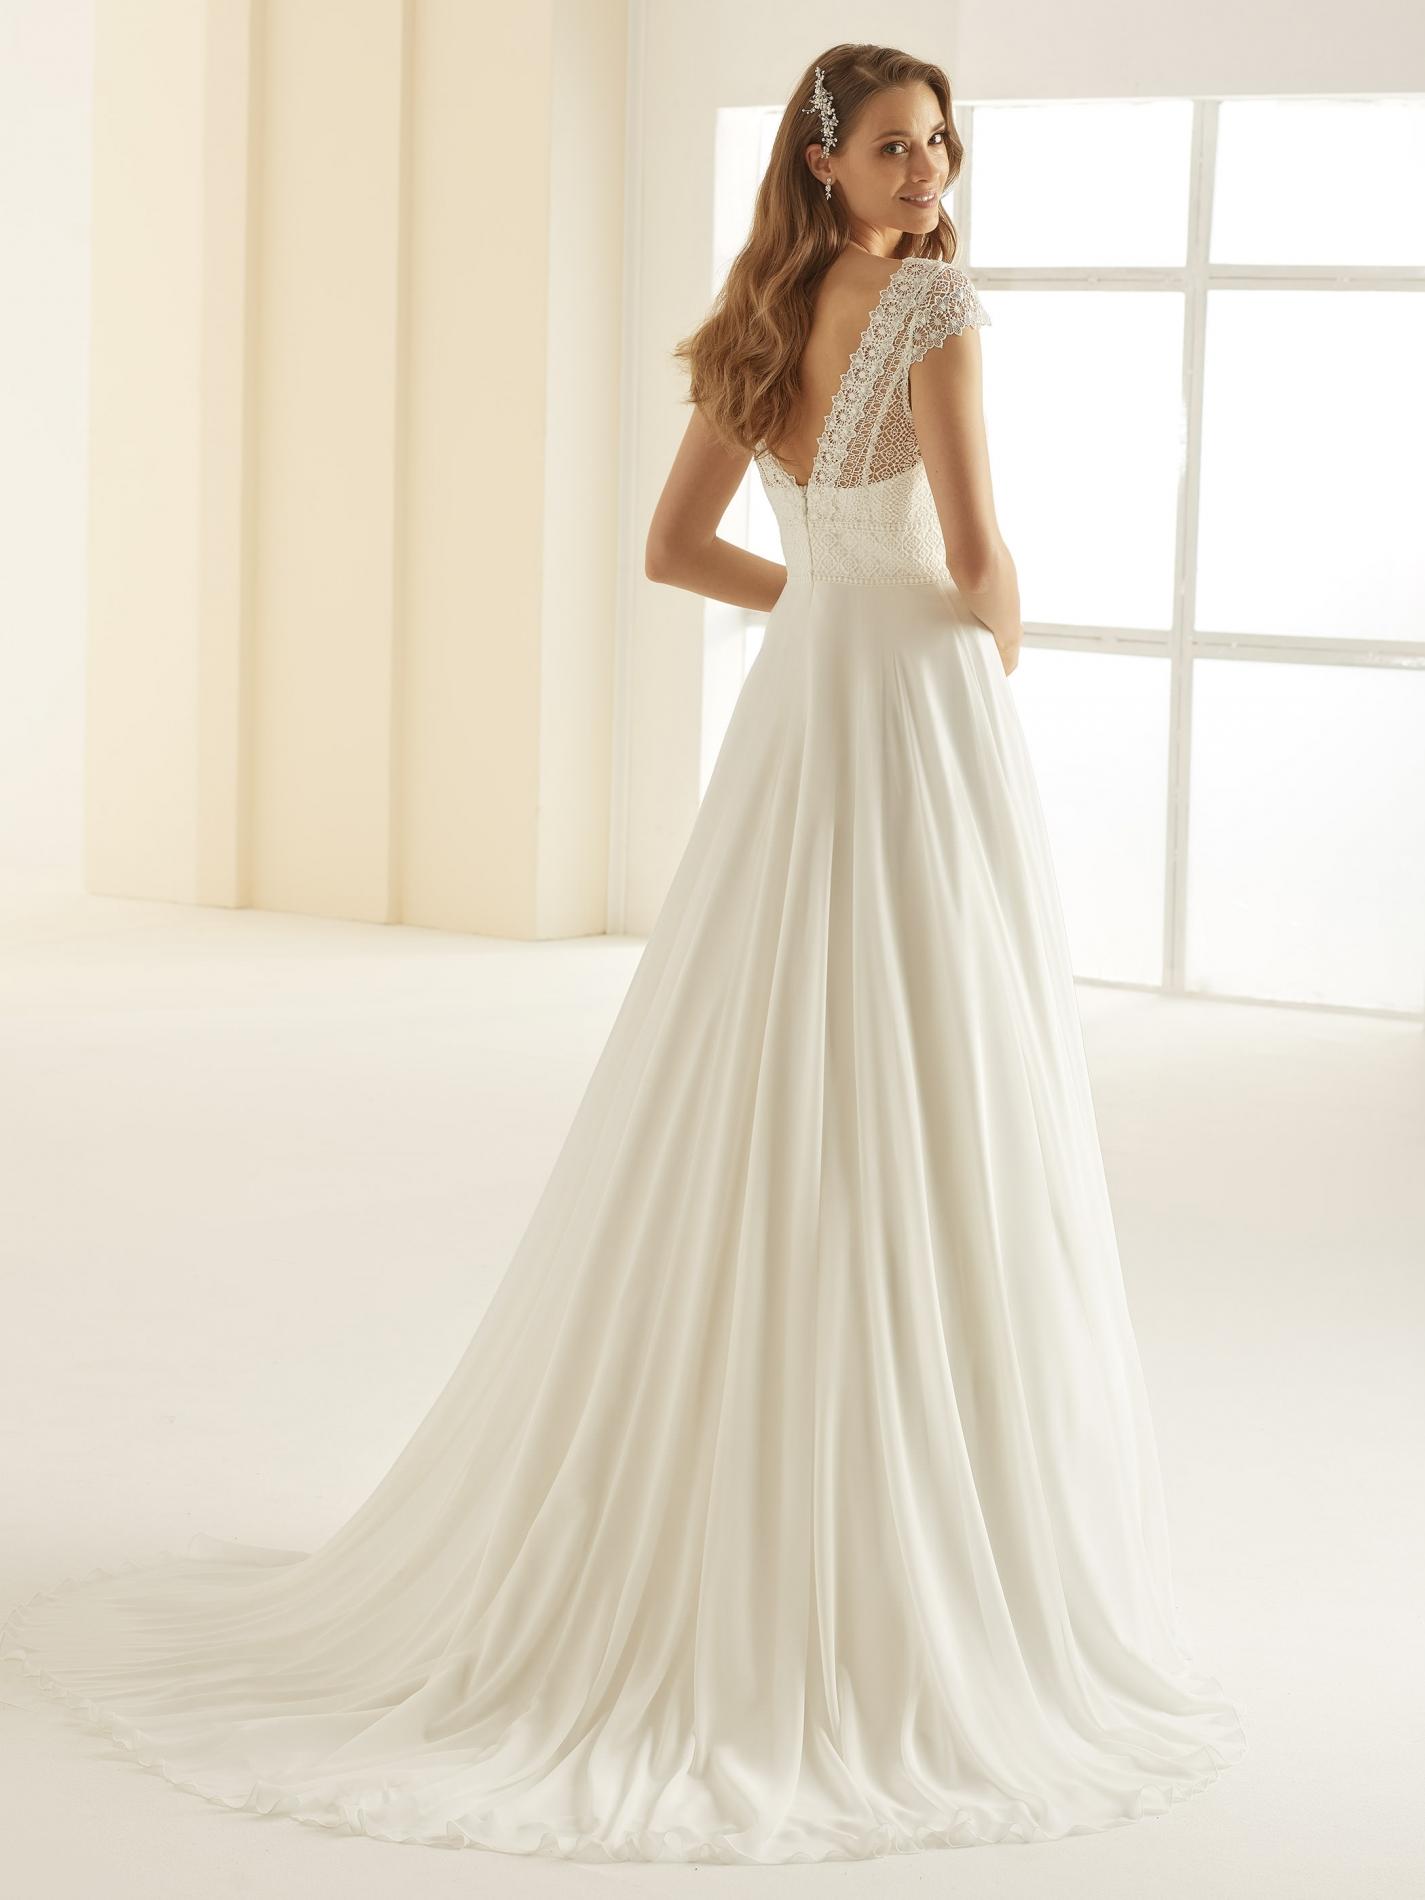 MARGARET-Bianco-Evento-bridal-dress-(3)